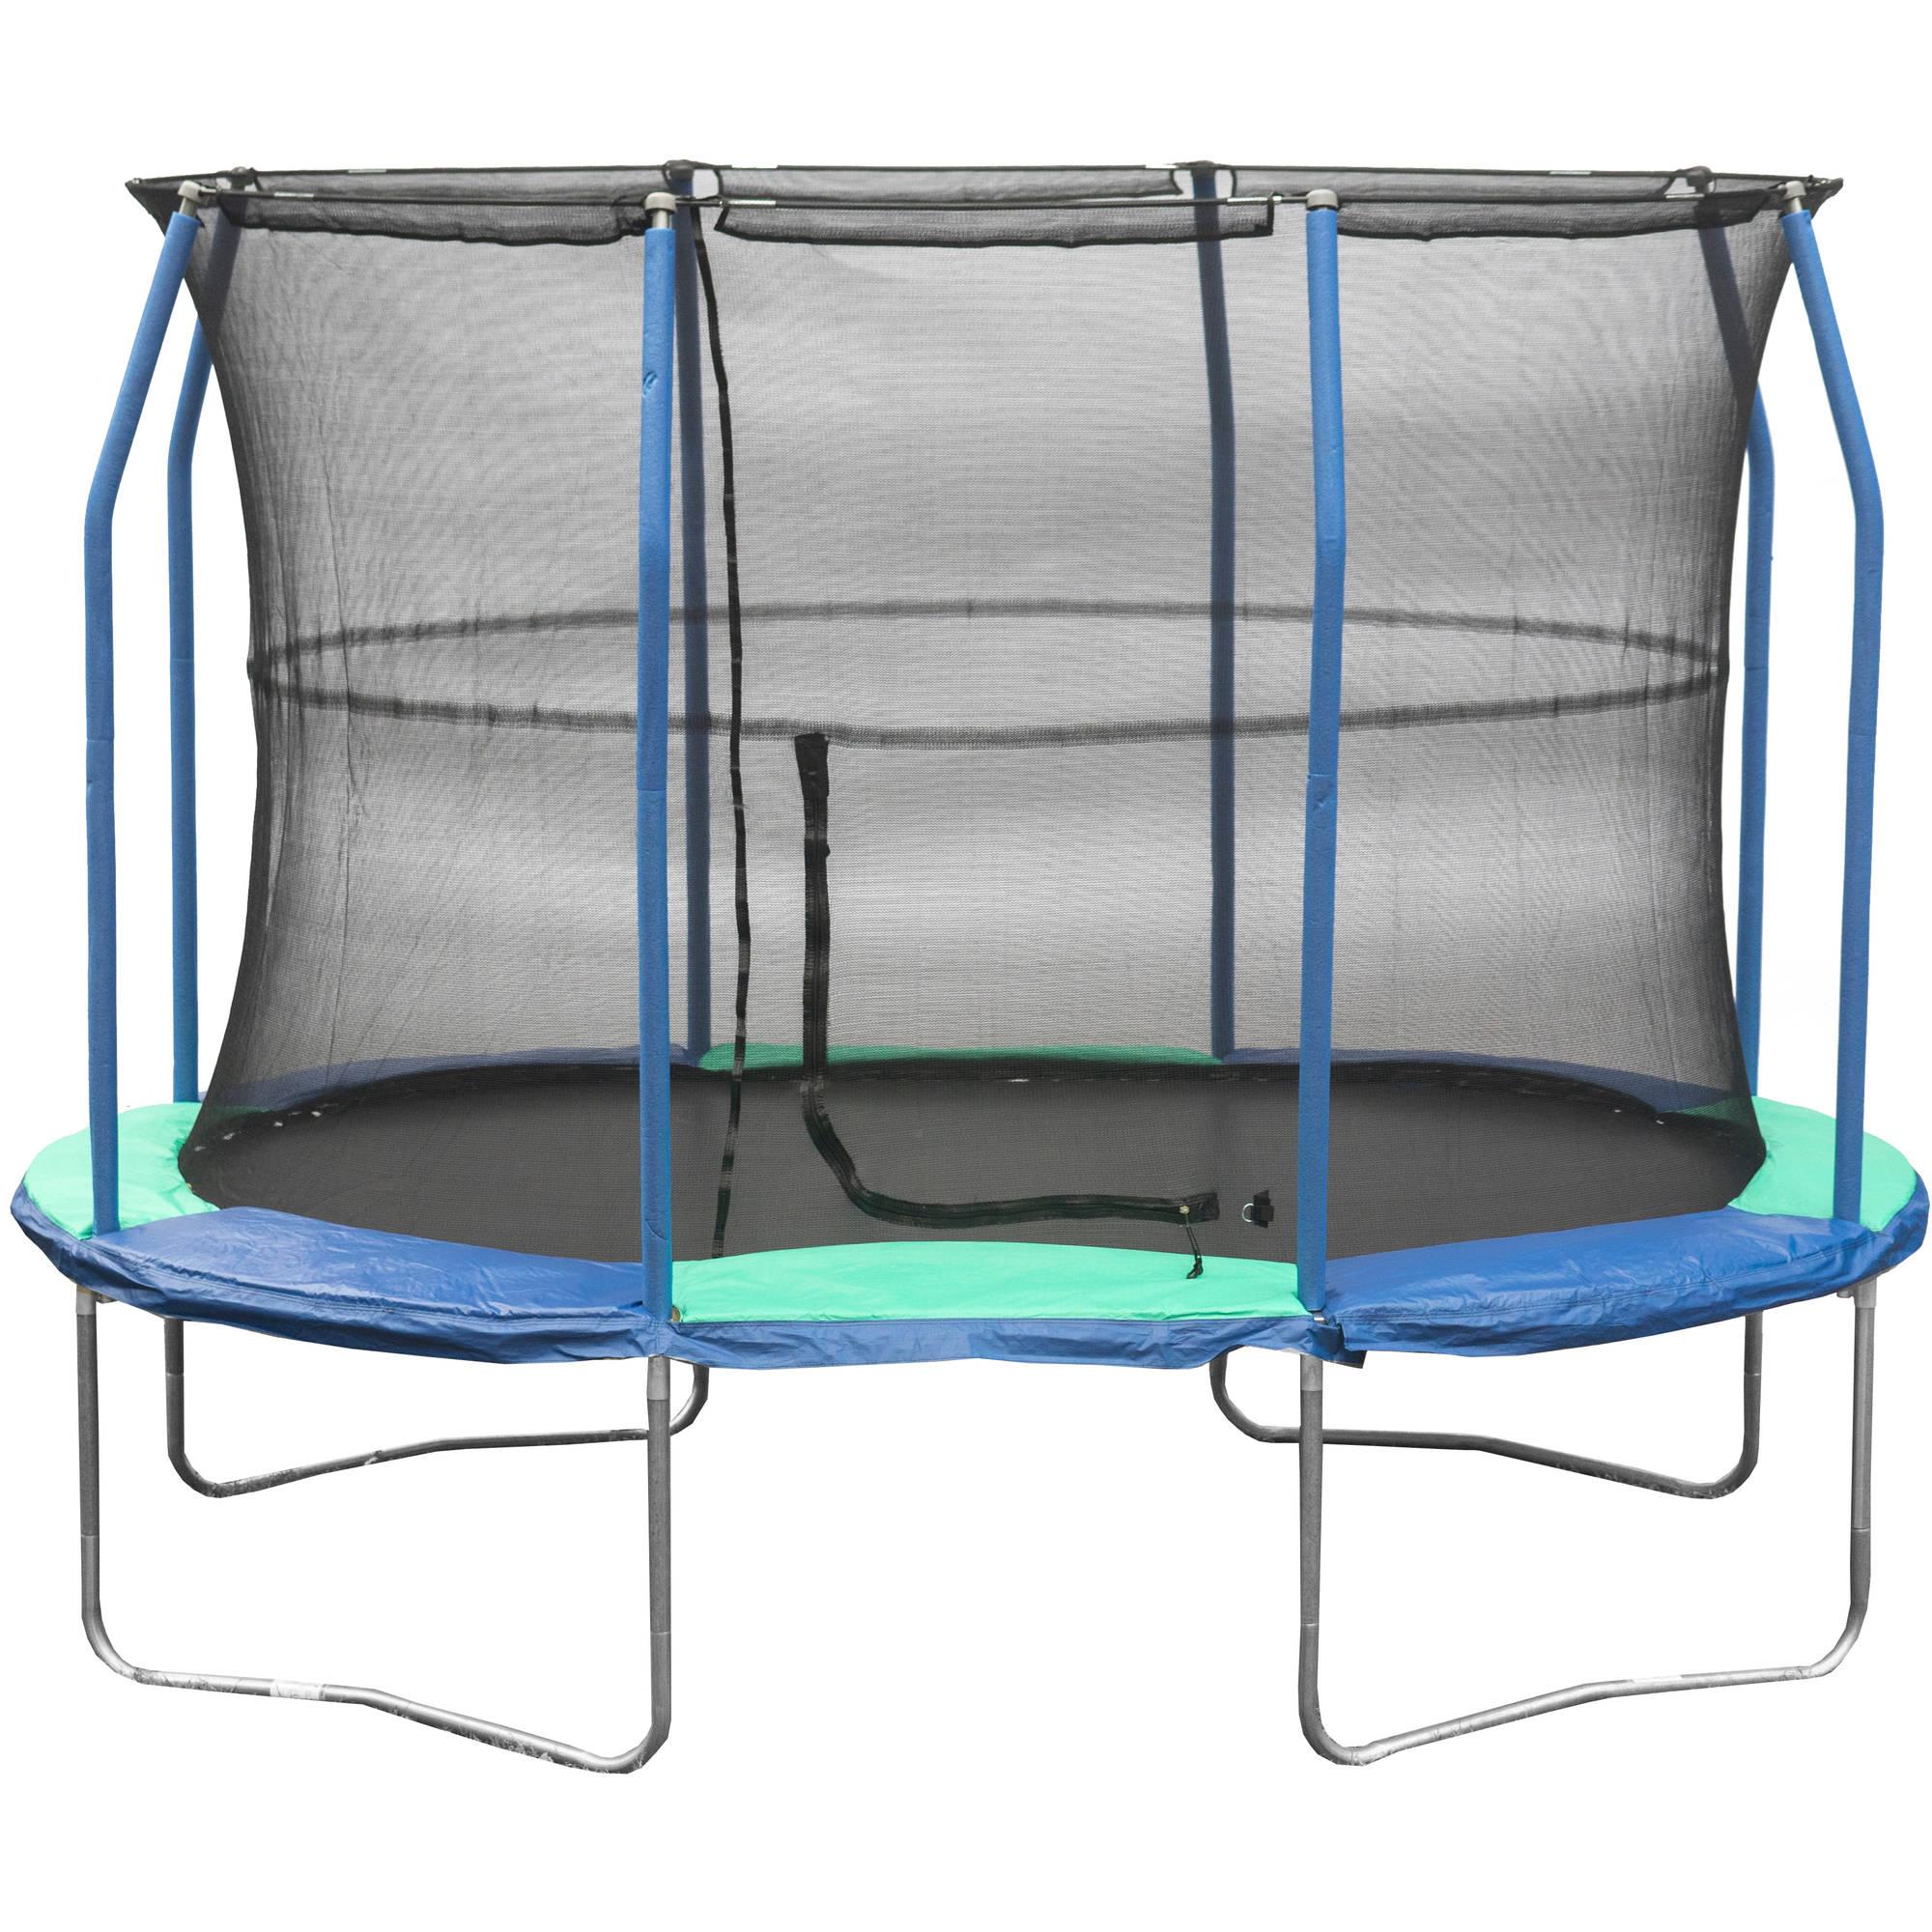 Jumpking trampolin totaldiscount